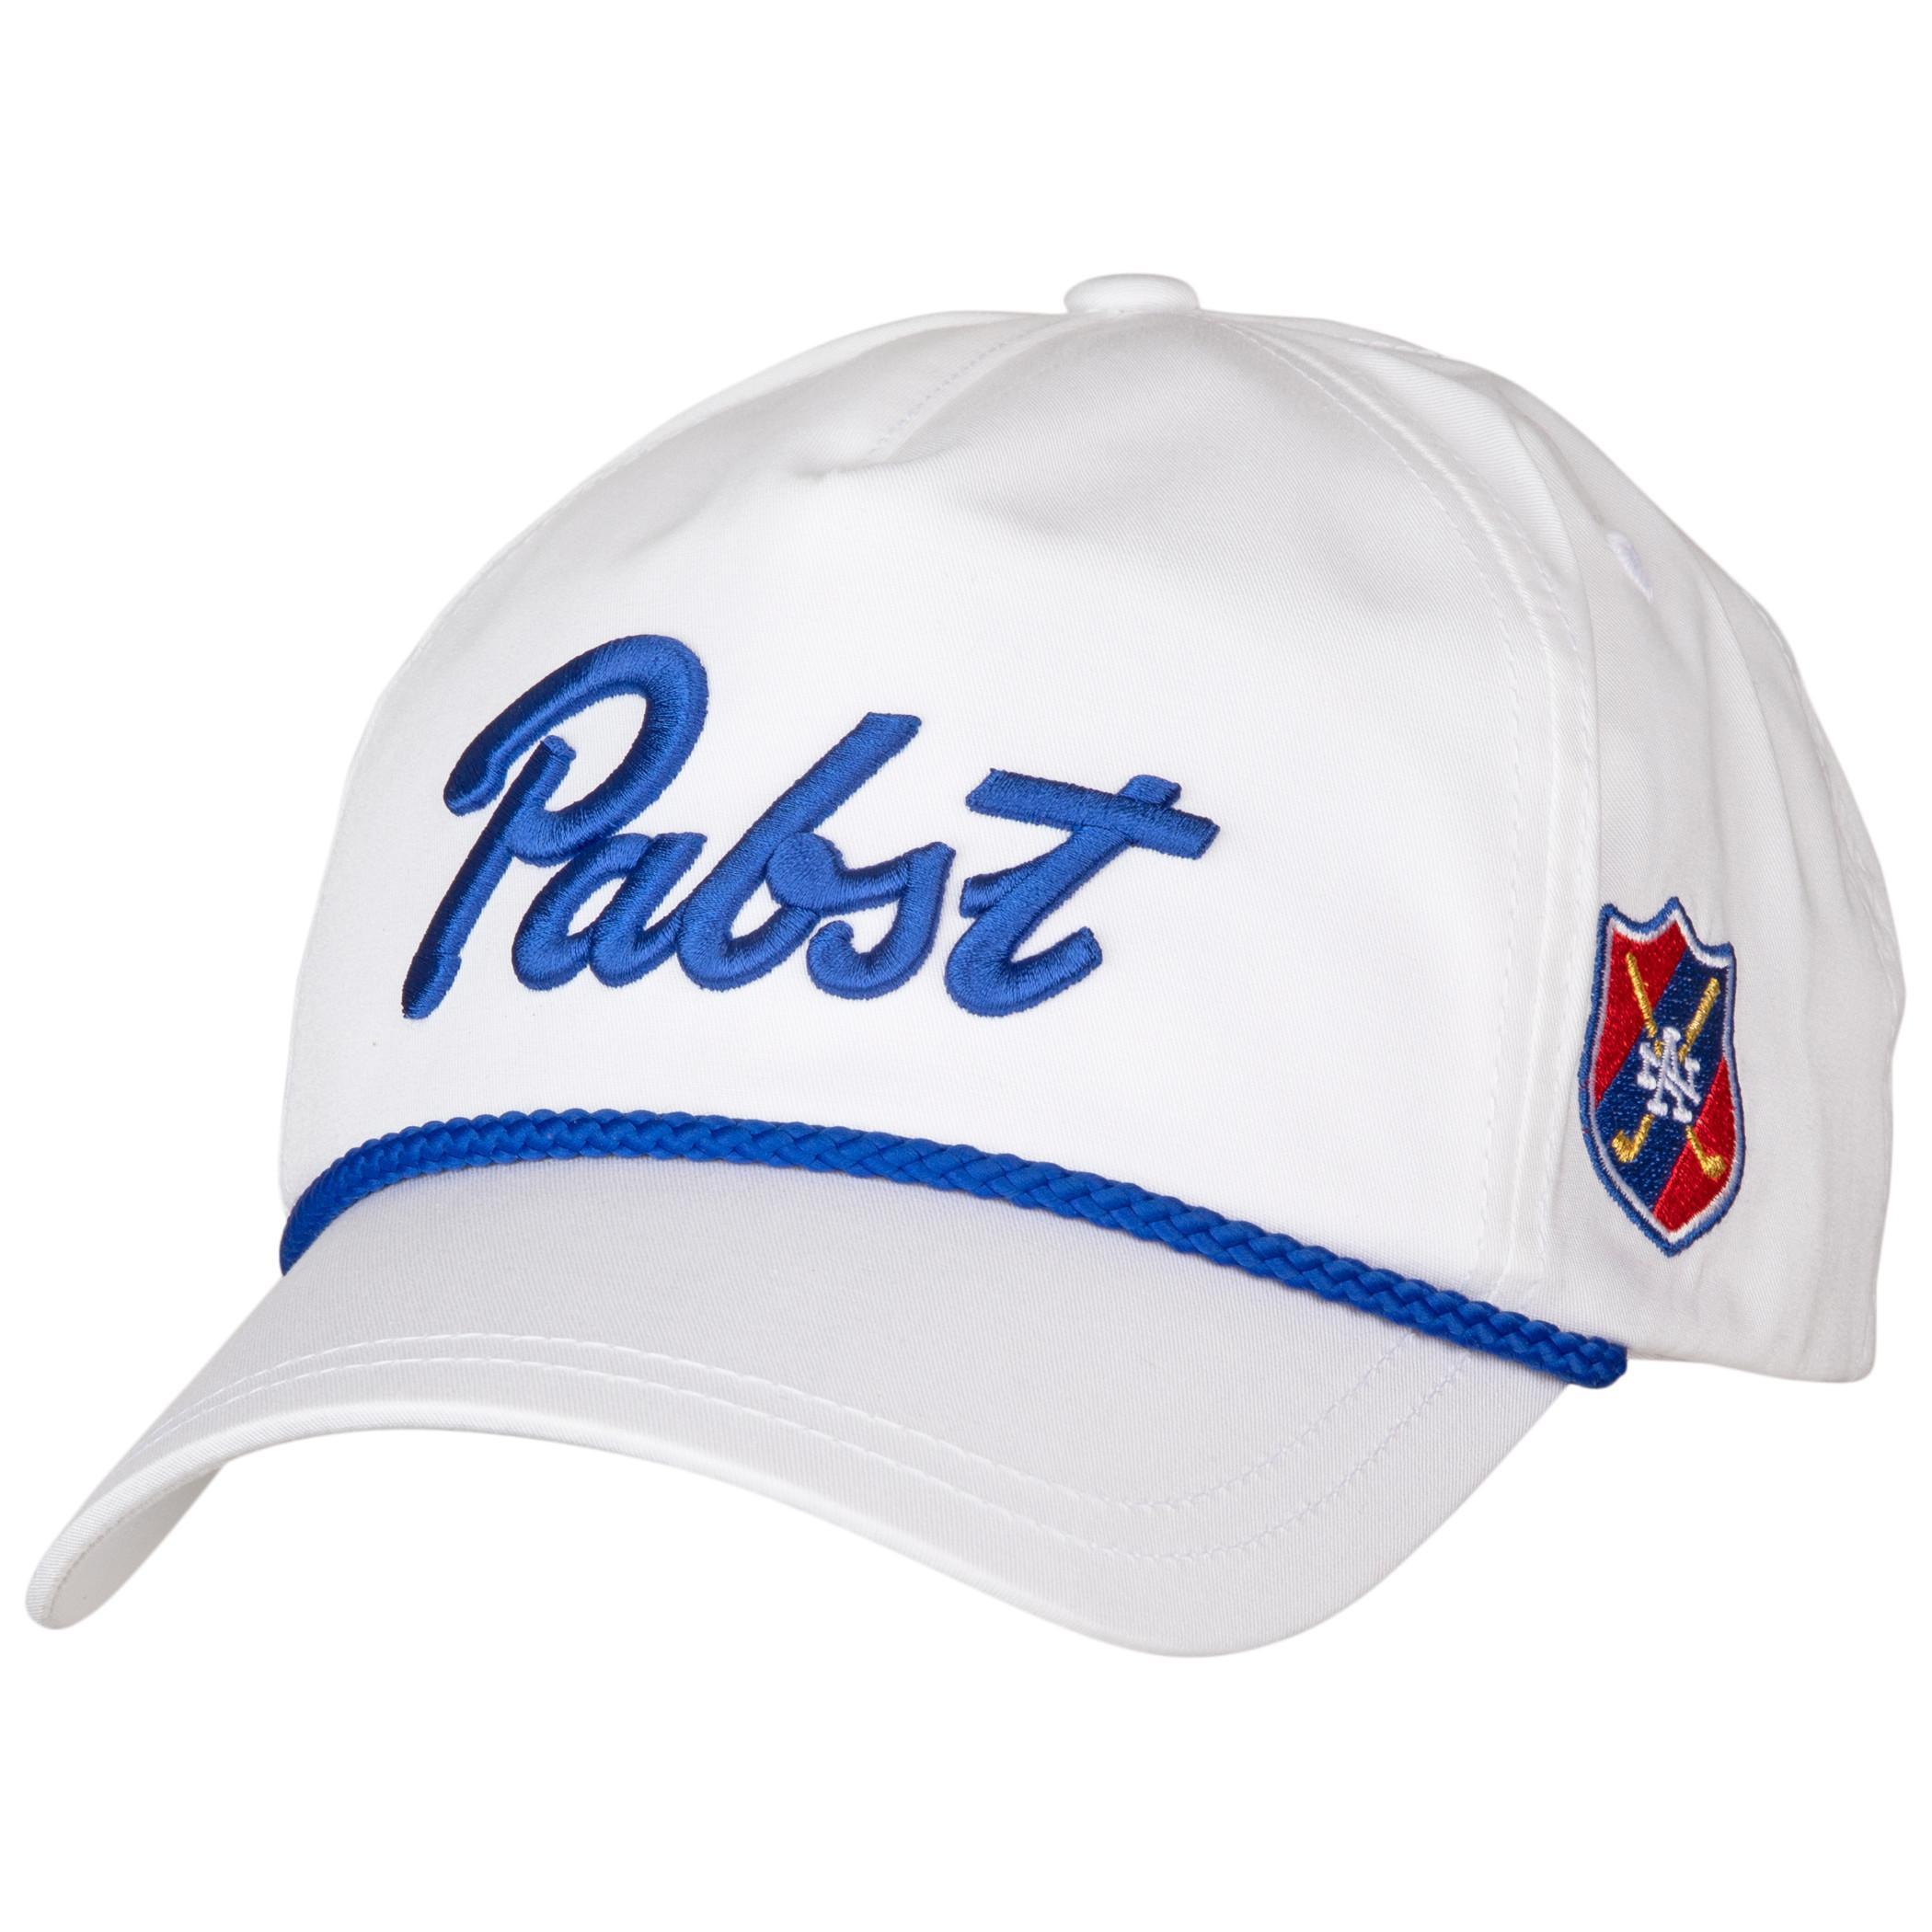 Pabst Blue Ribbon Roped Brim Hat